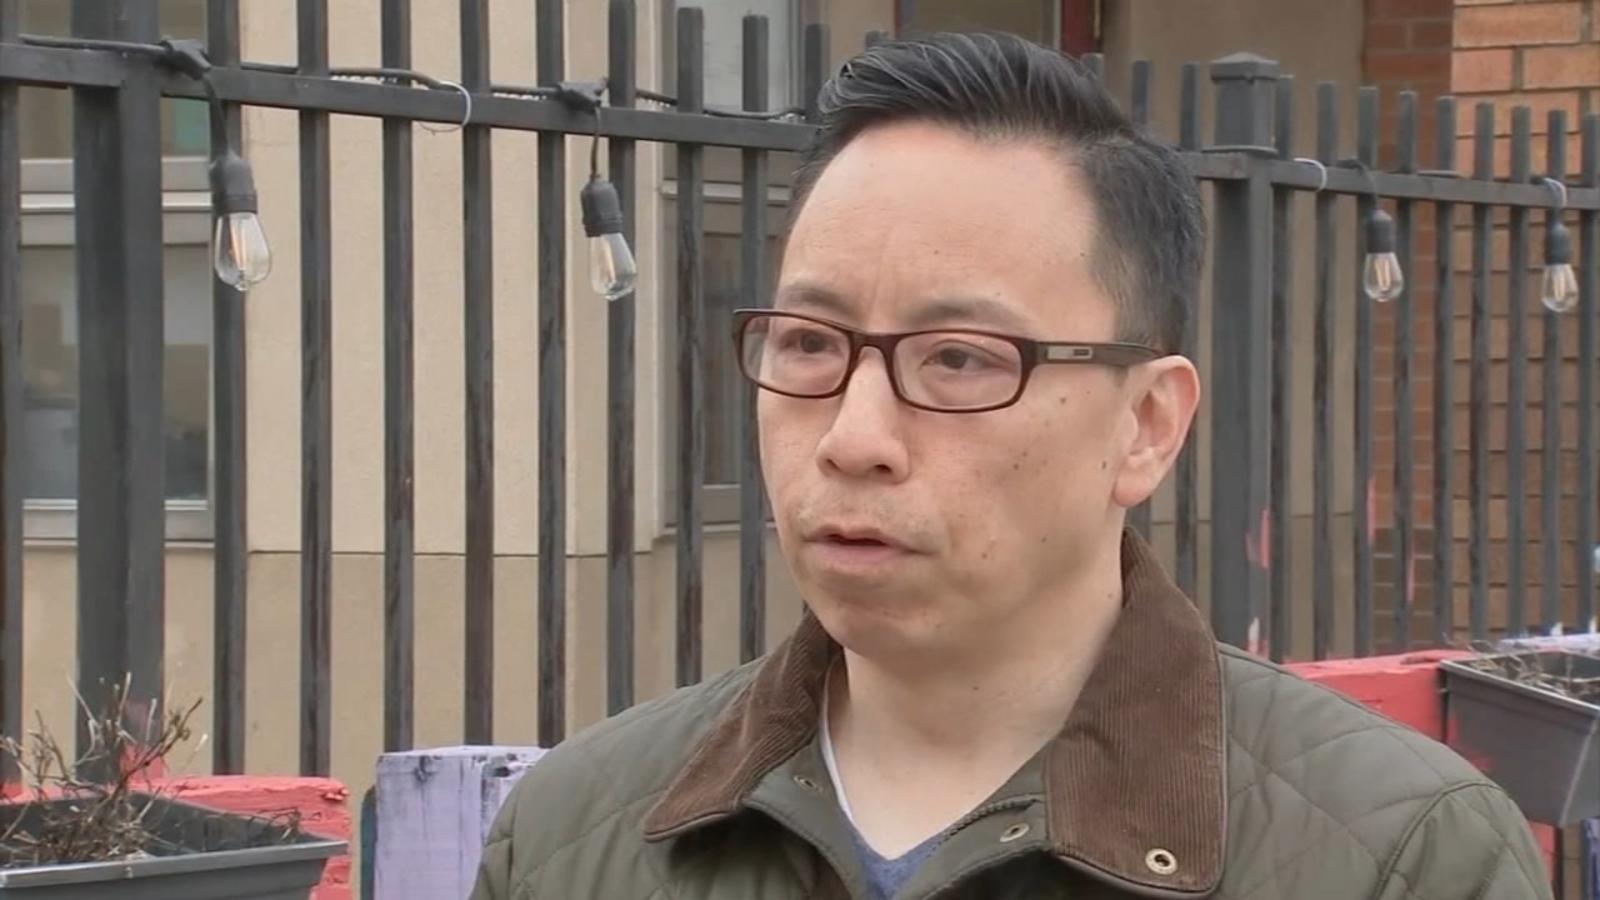 Some Philadelphia Asian Americans link attacks to coronavirus rhetoric